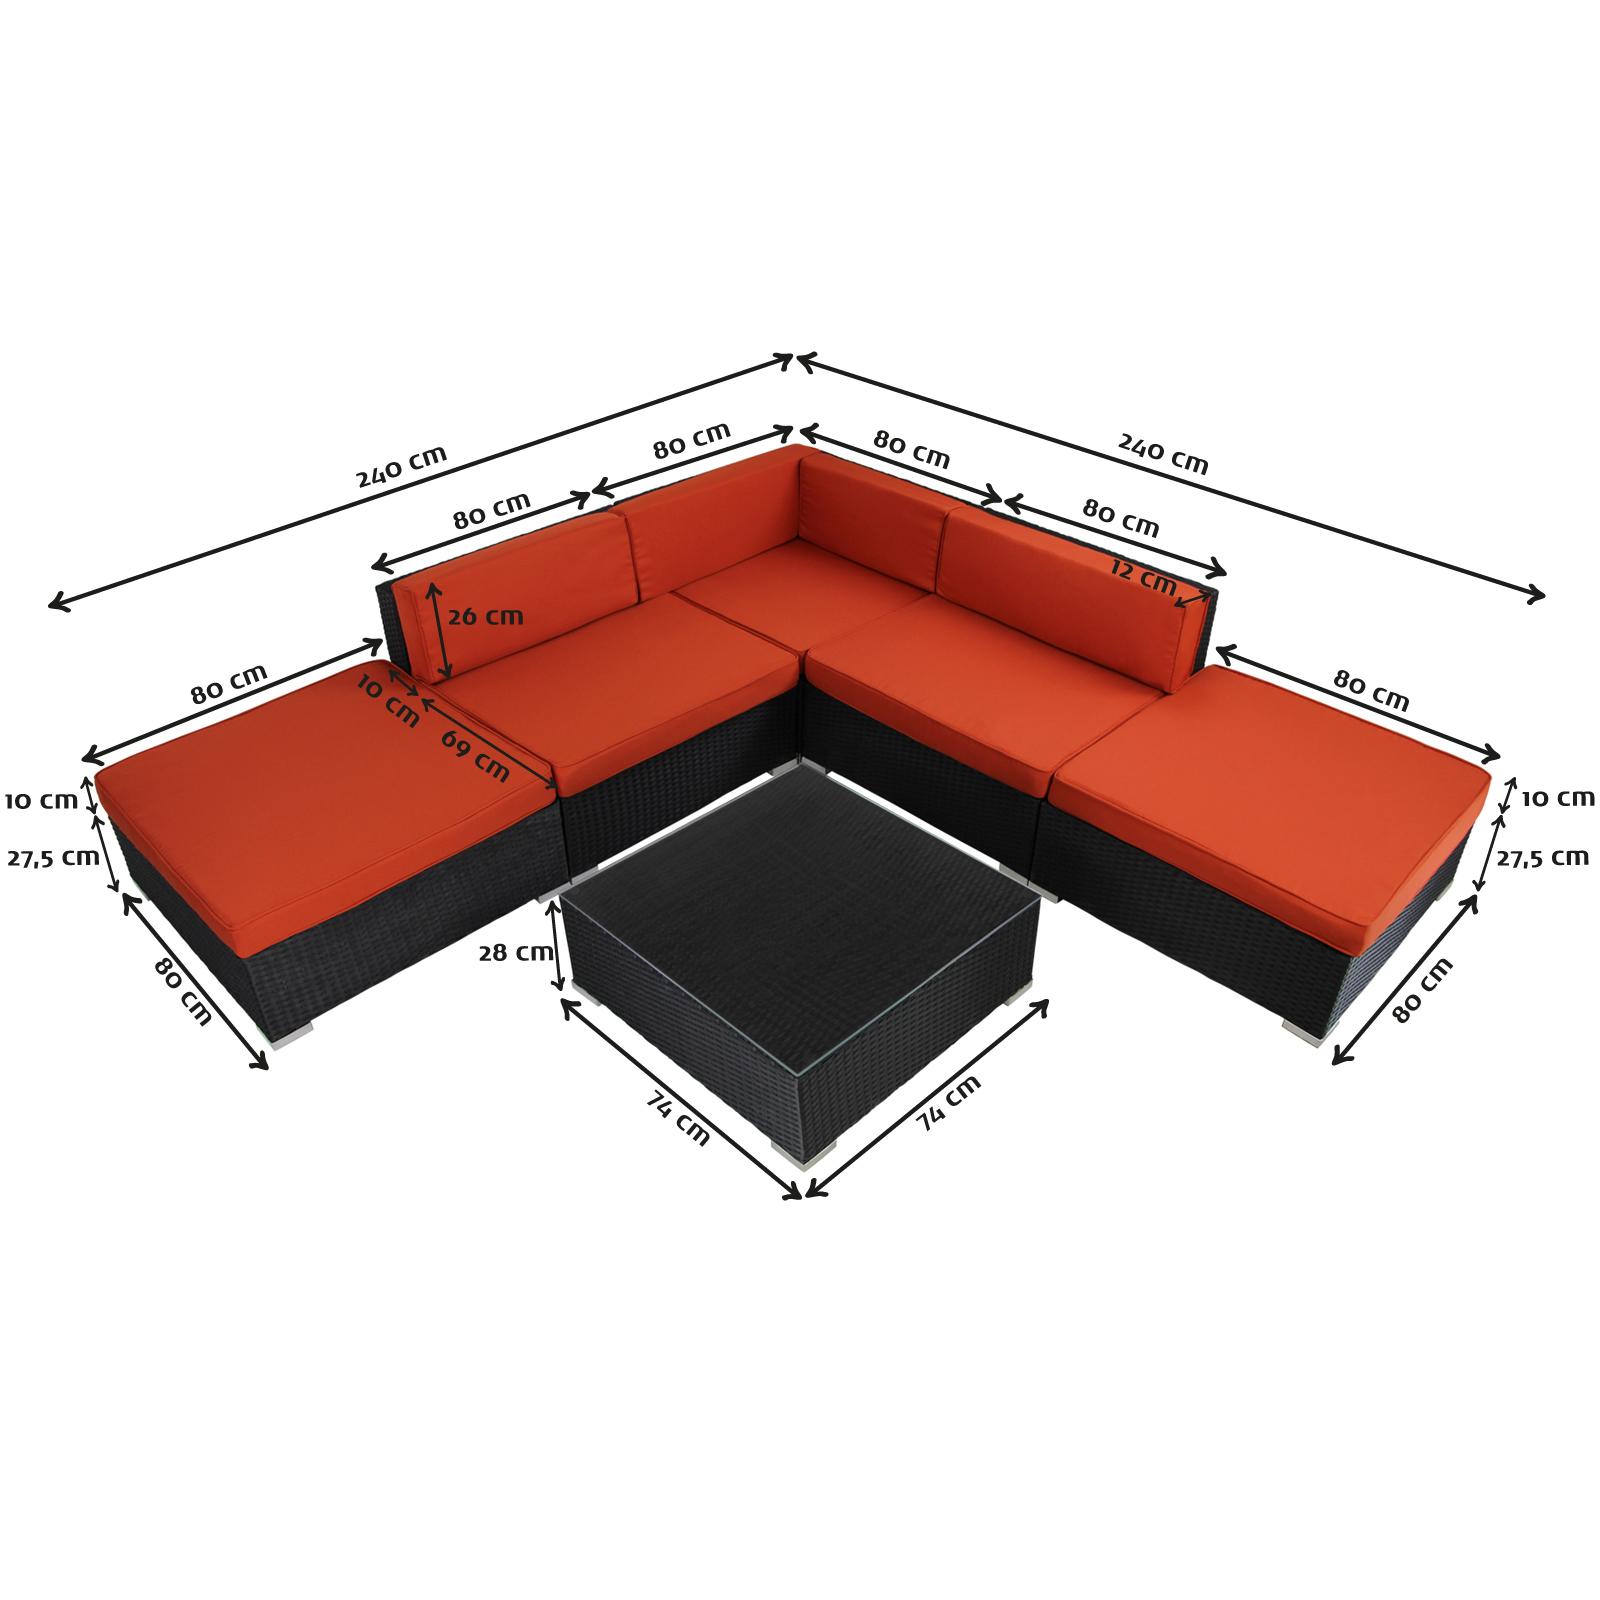 Maße Polyrattan-Lounge Gartengarnitur ARIZONA